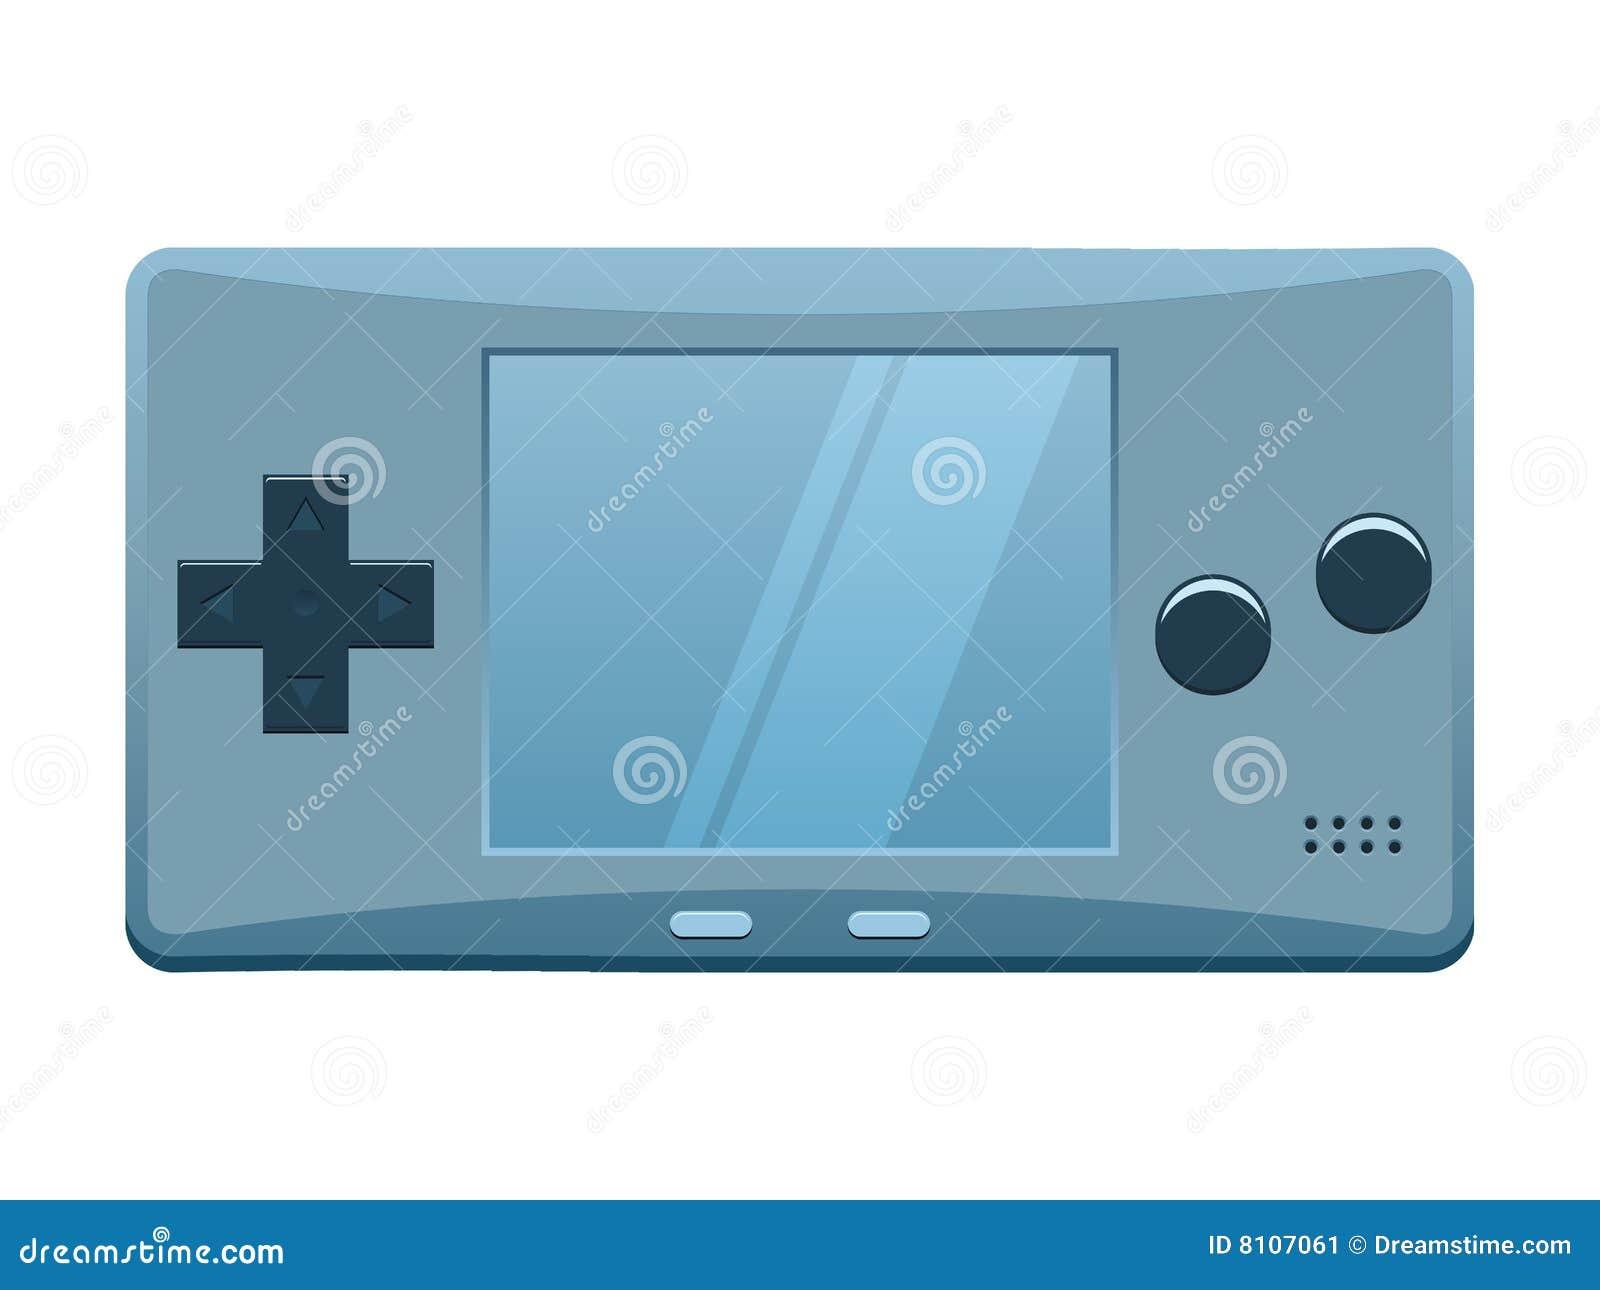 console portative de jeux image stock image 8107061. Black Bedroom Furniture Sets. Home Design Ideas